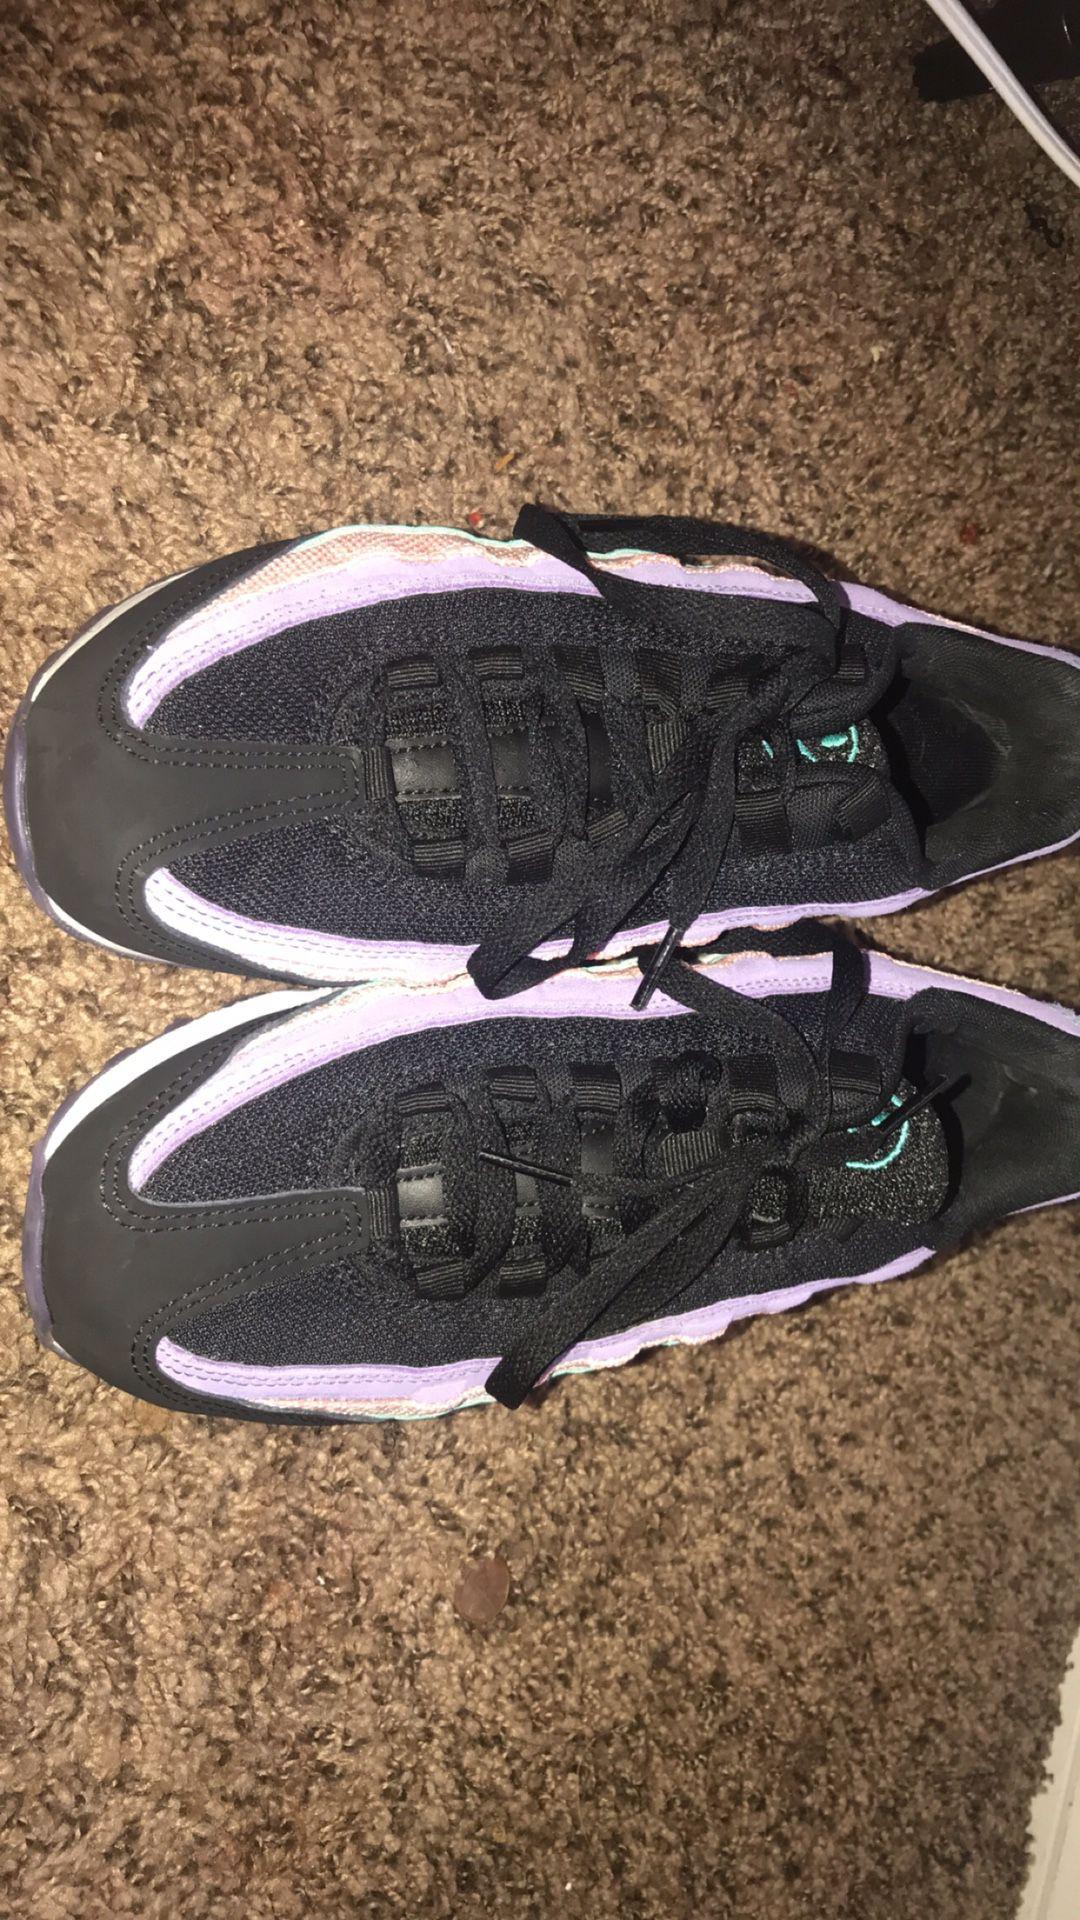 Nike Air Max 97 (size 7y)